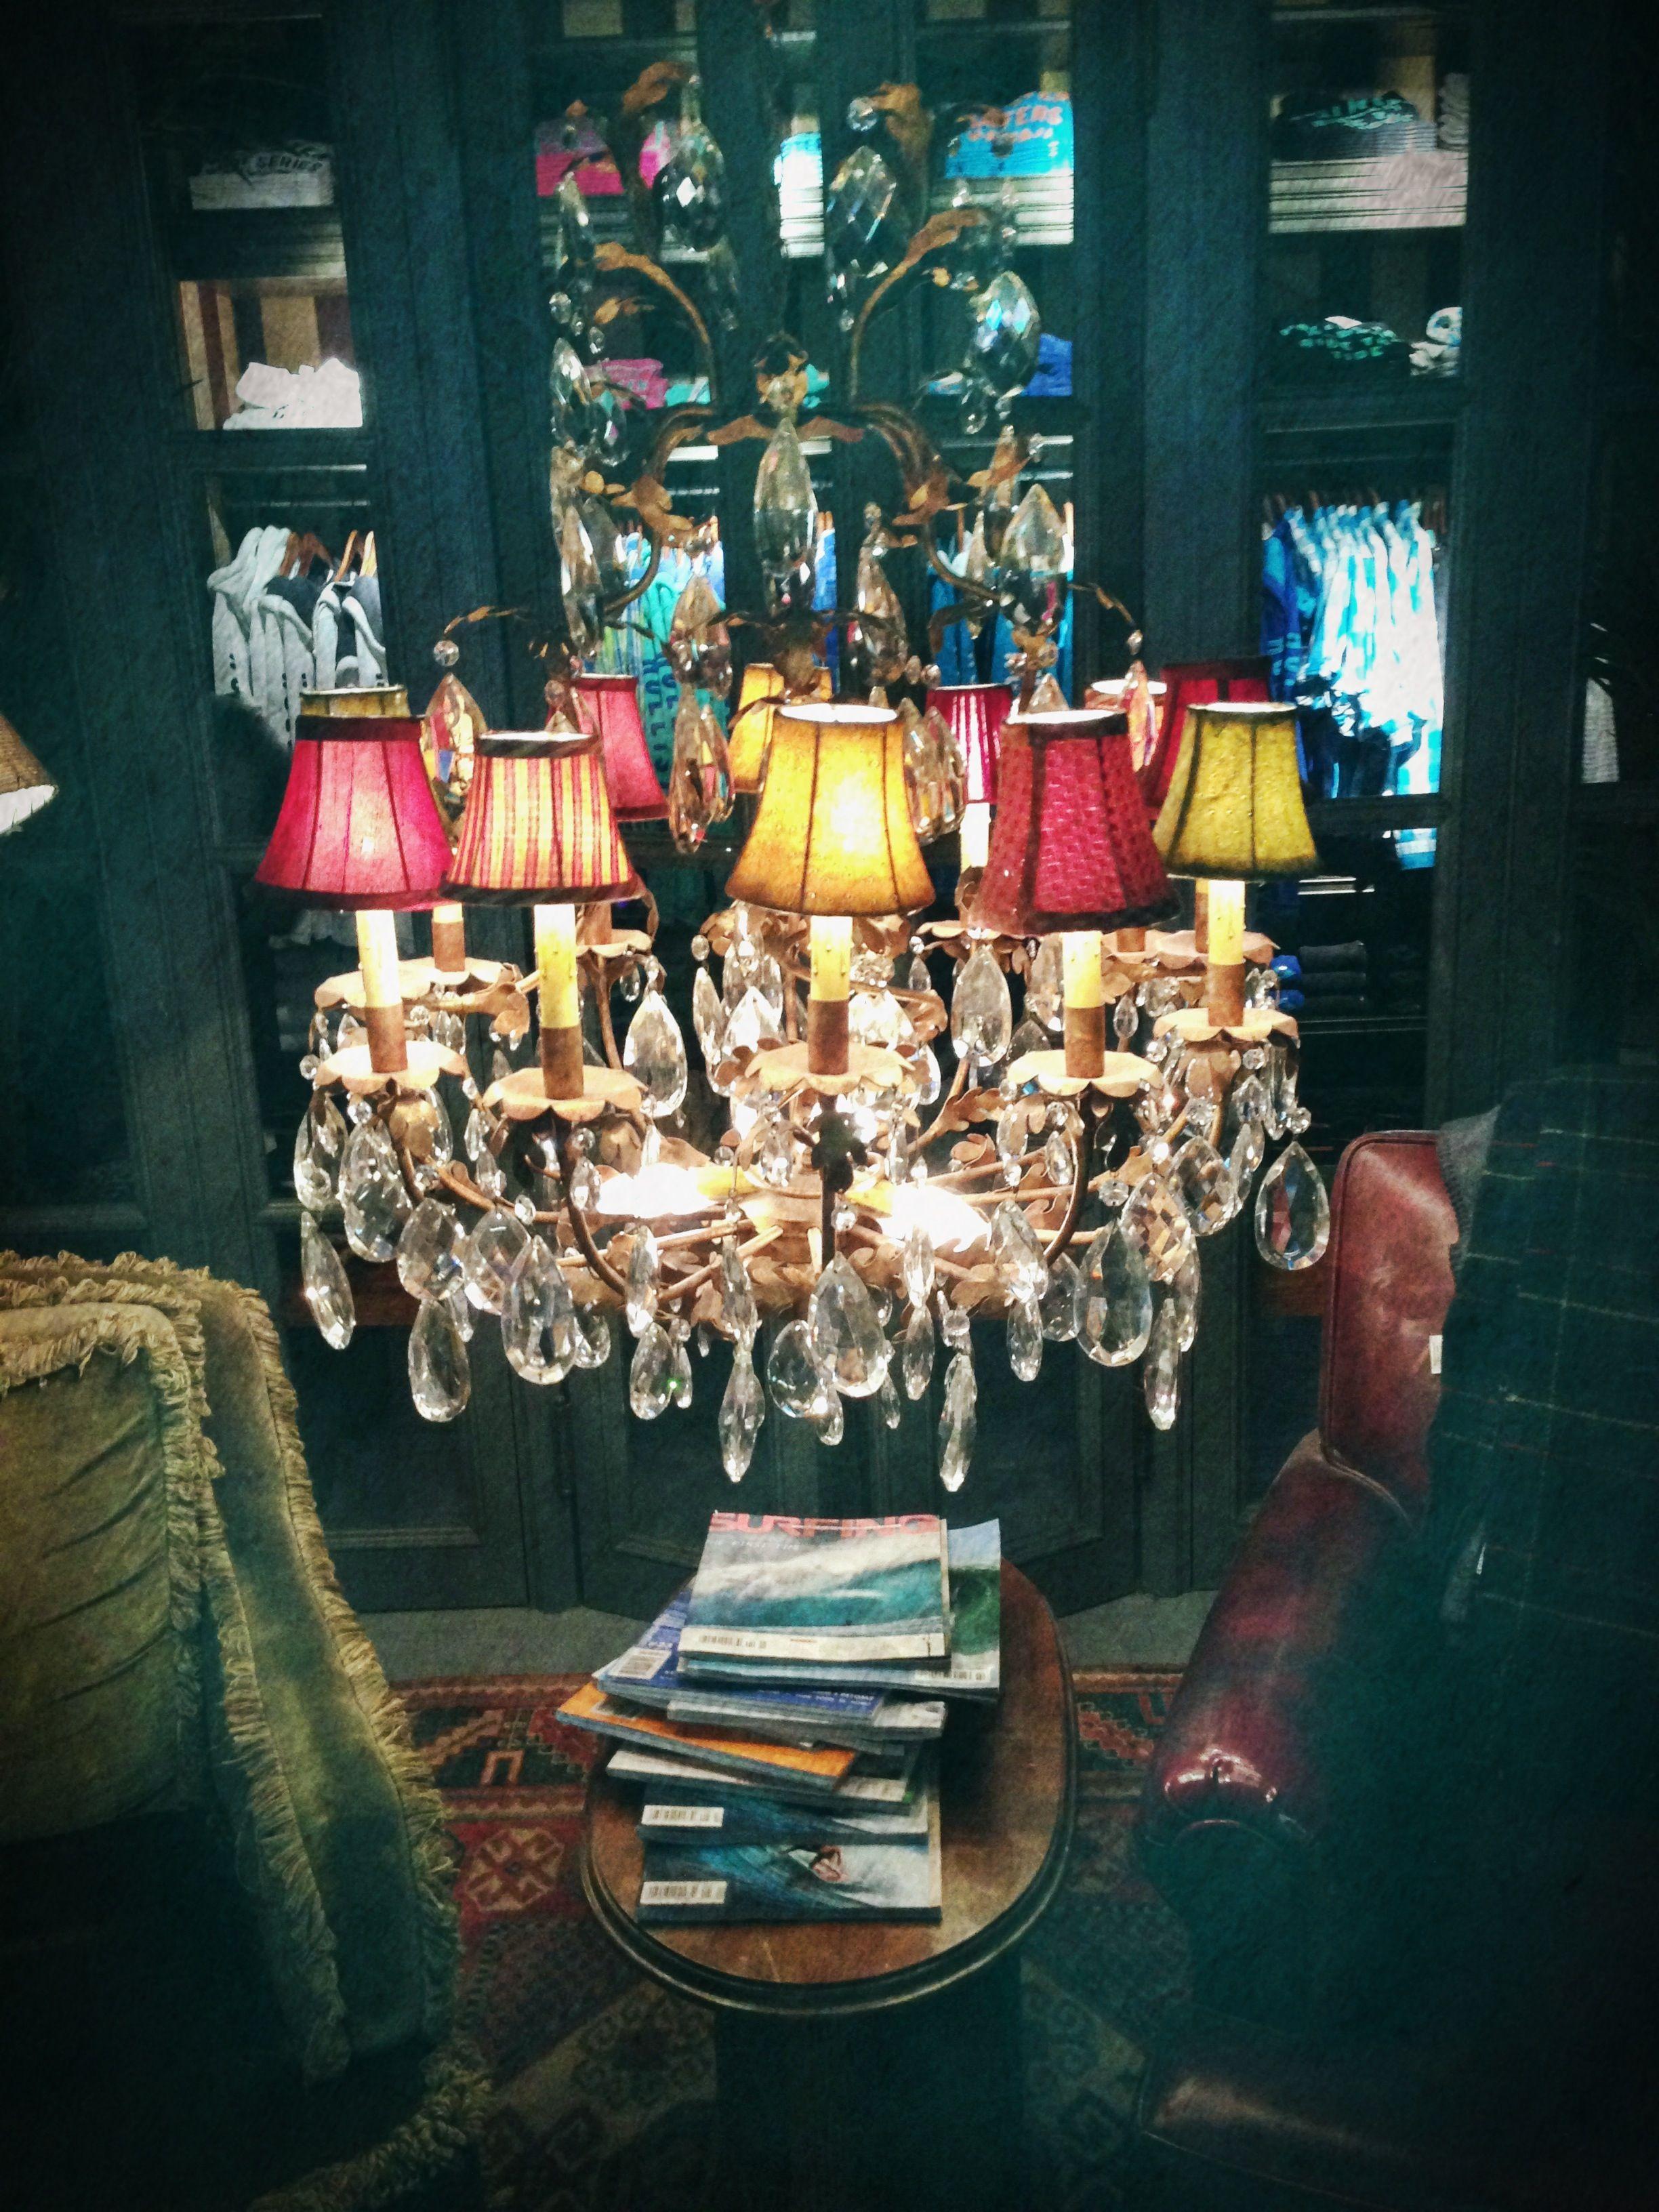 Chandelier In The Hollister shop Store – Shop Chandeliers